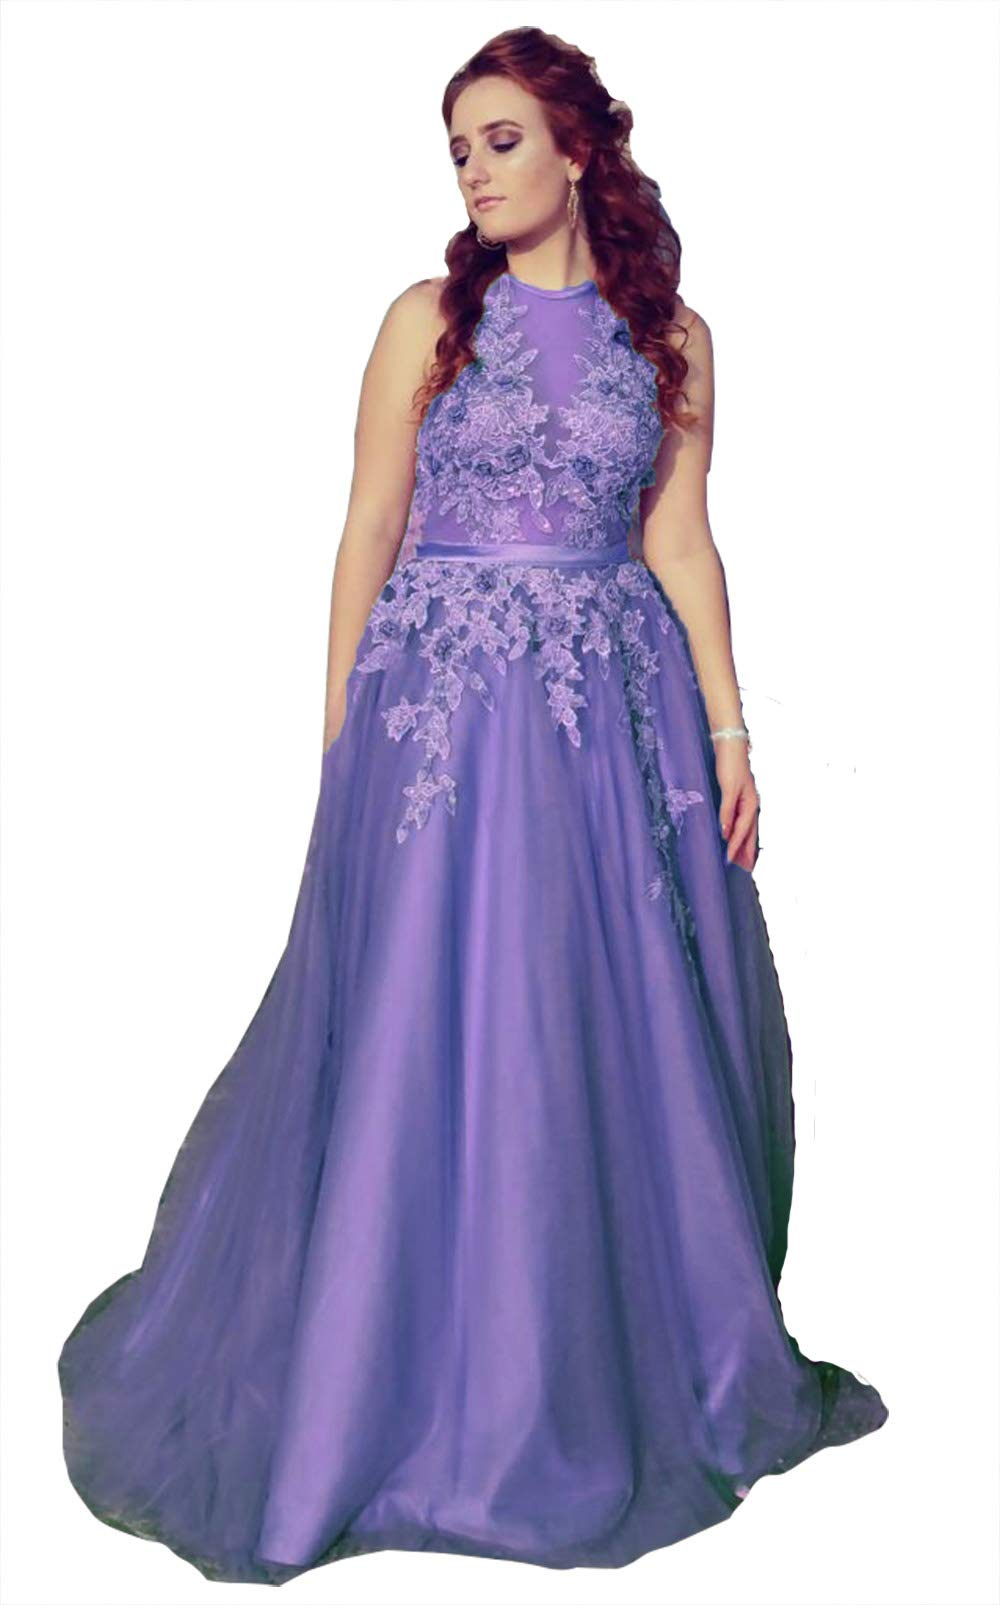 f3780c094522 Home/Brands/Fanciest Dresses/Fanciest Women's Halter Prom Dresses Long 2019 Appliques  Backless Evening Formal Dress Dark Lavender US2. ; 